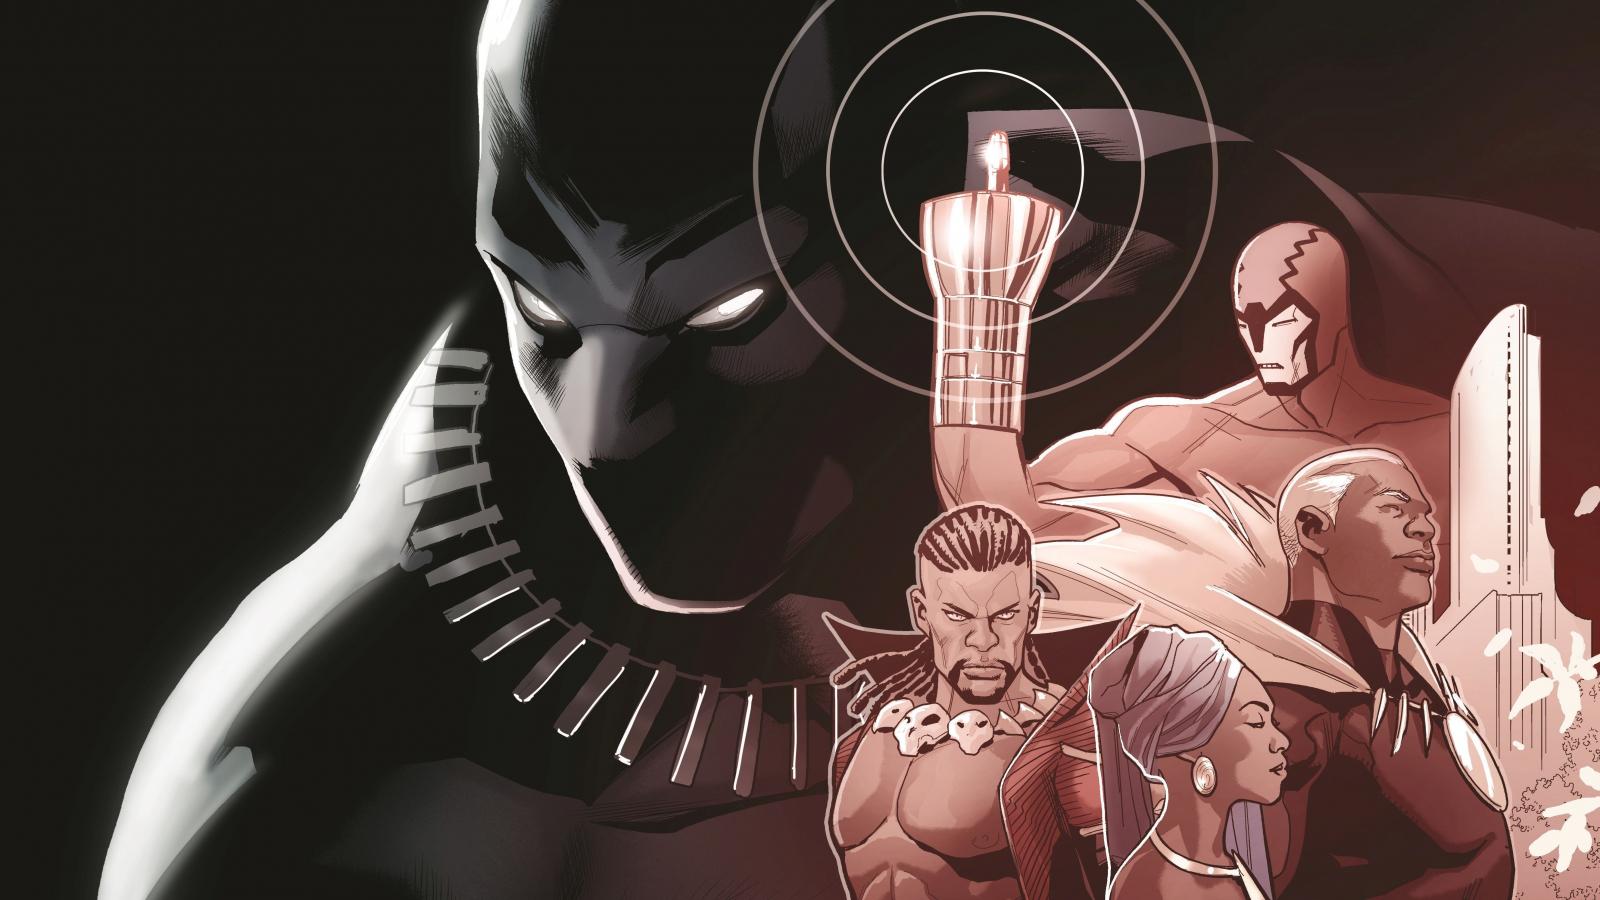 Black panther, superhero, comics, 1600x900 wallpaper